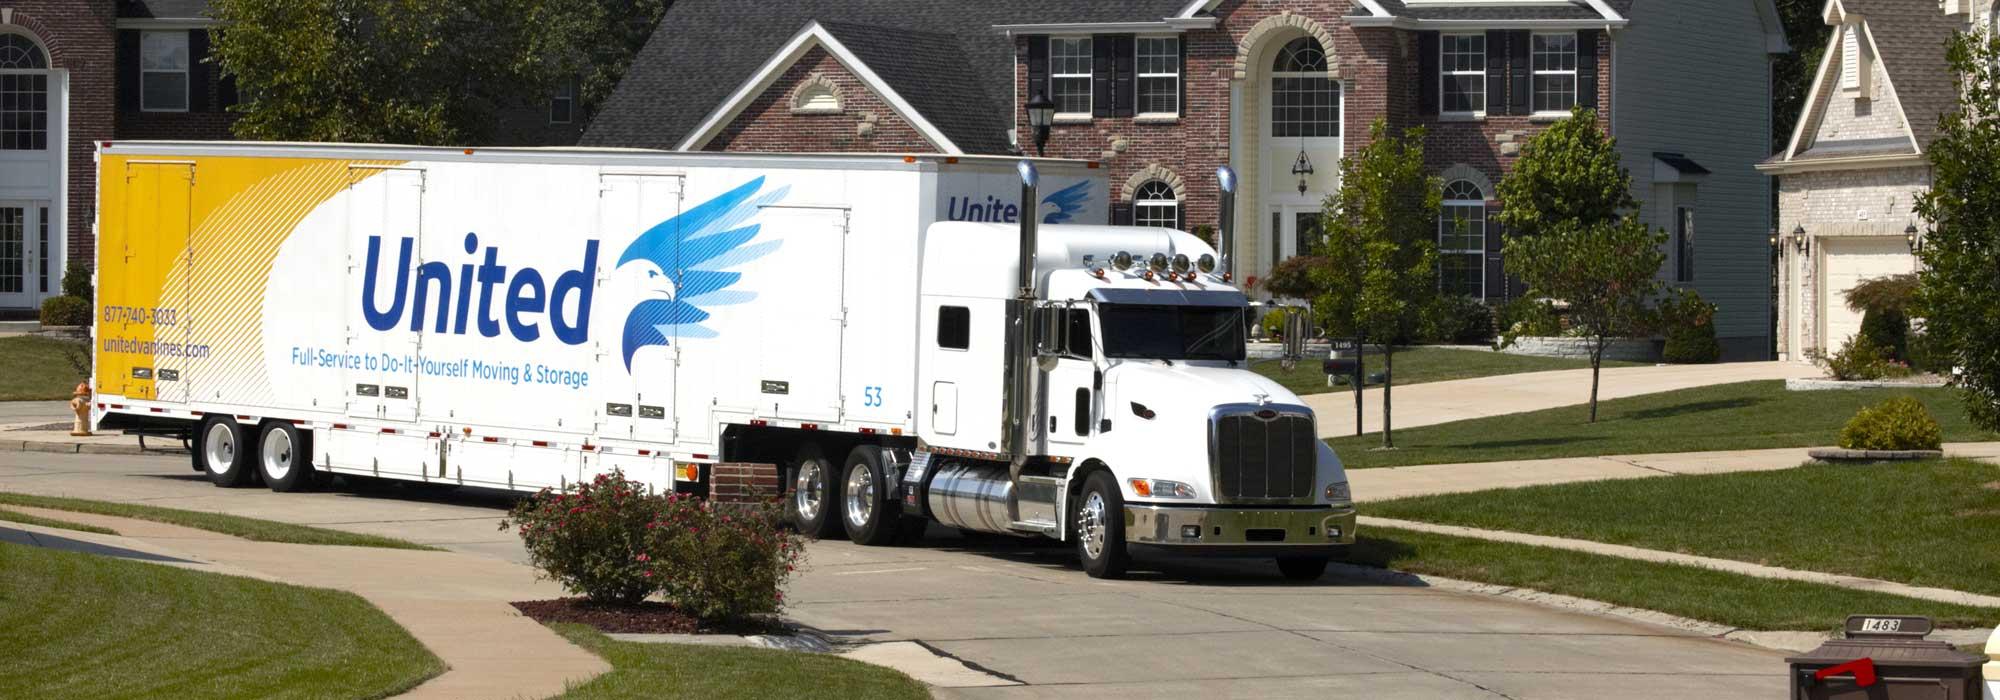 United Truck